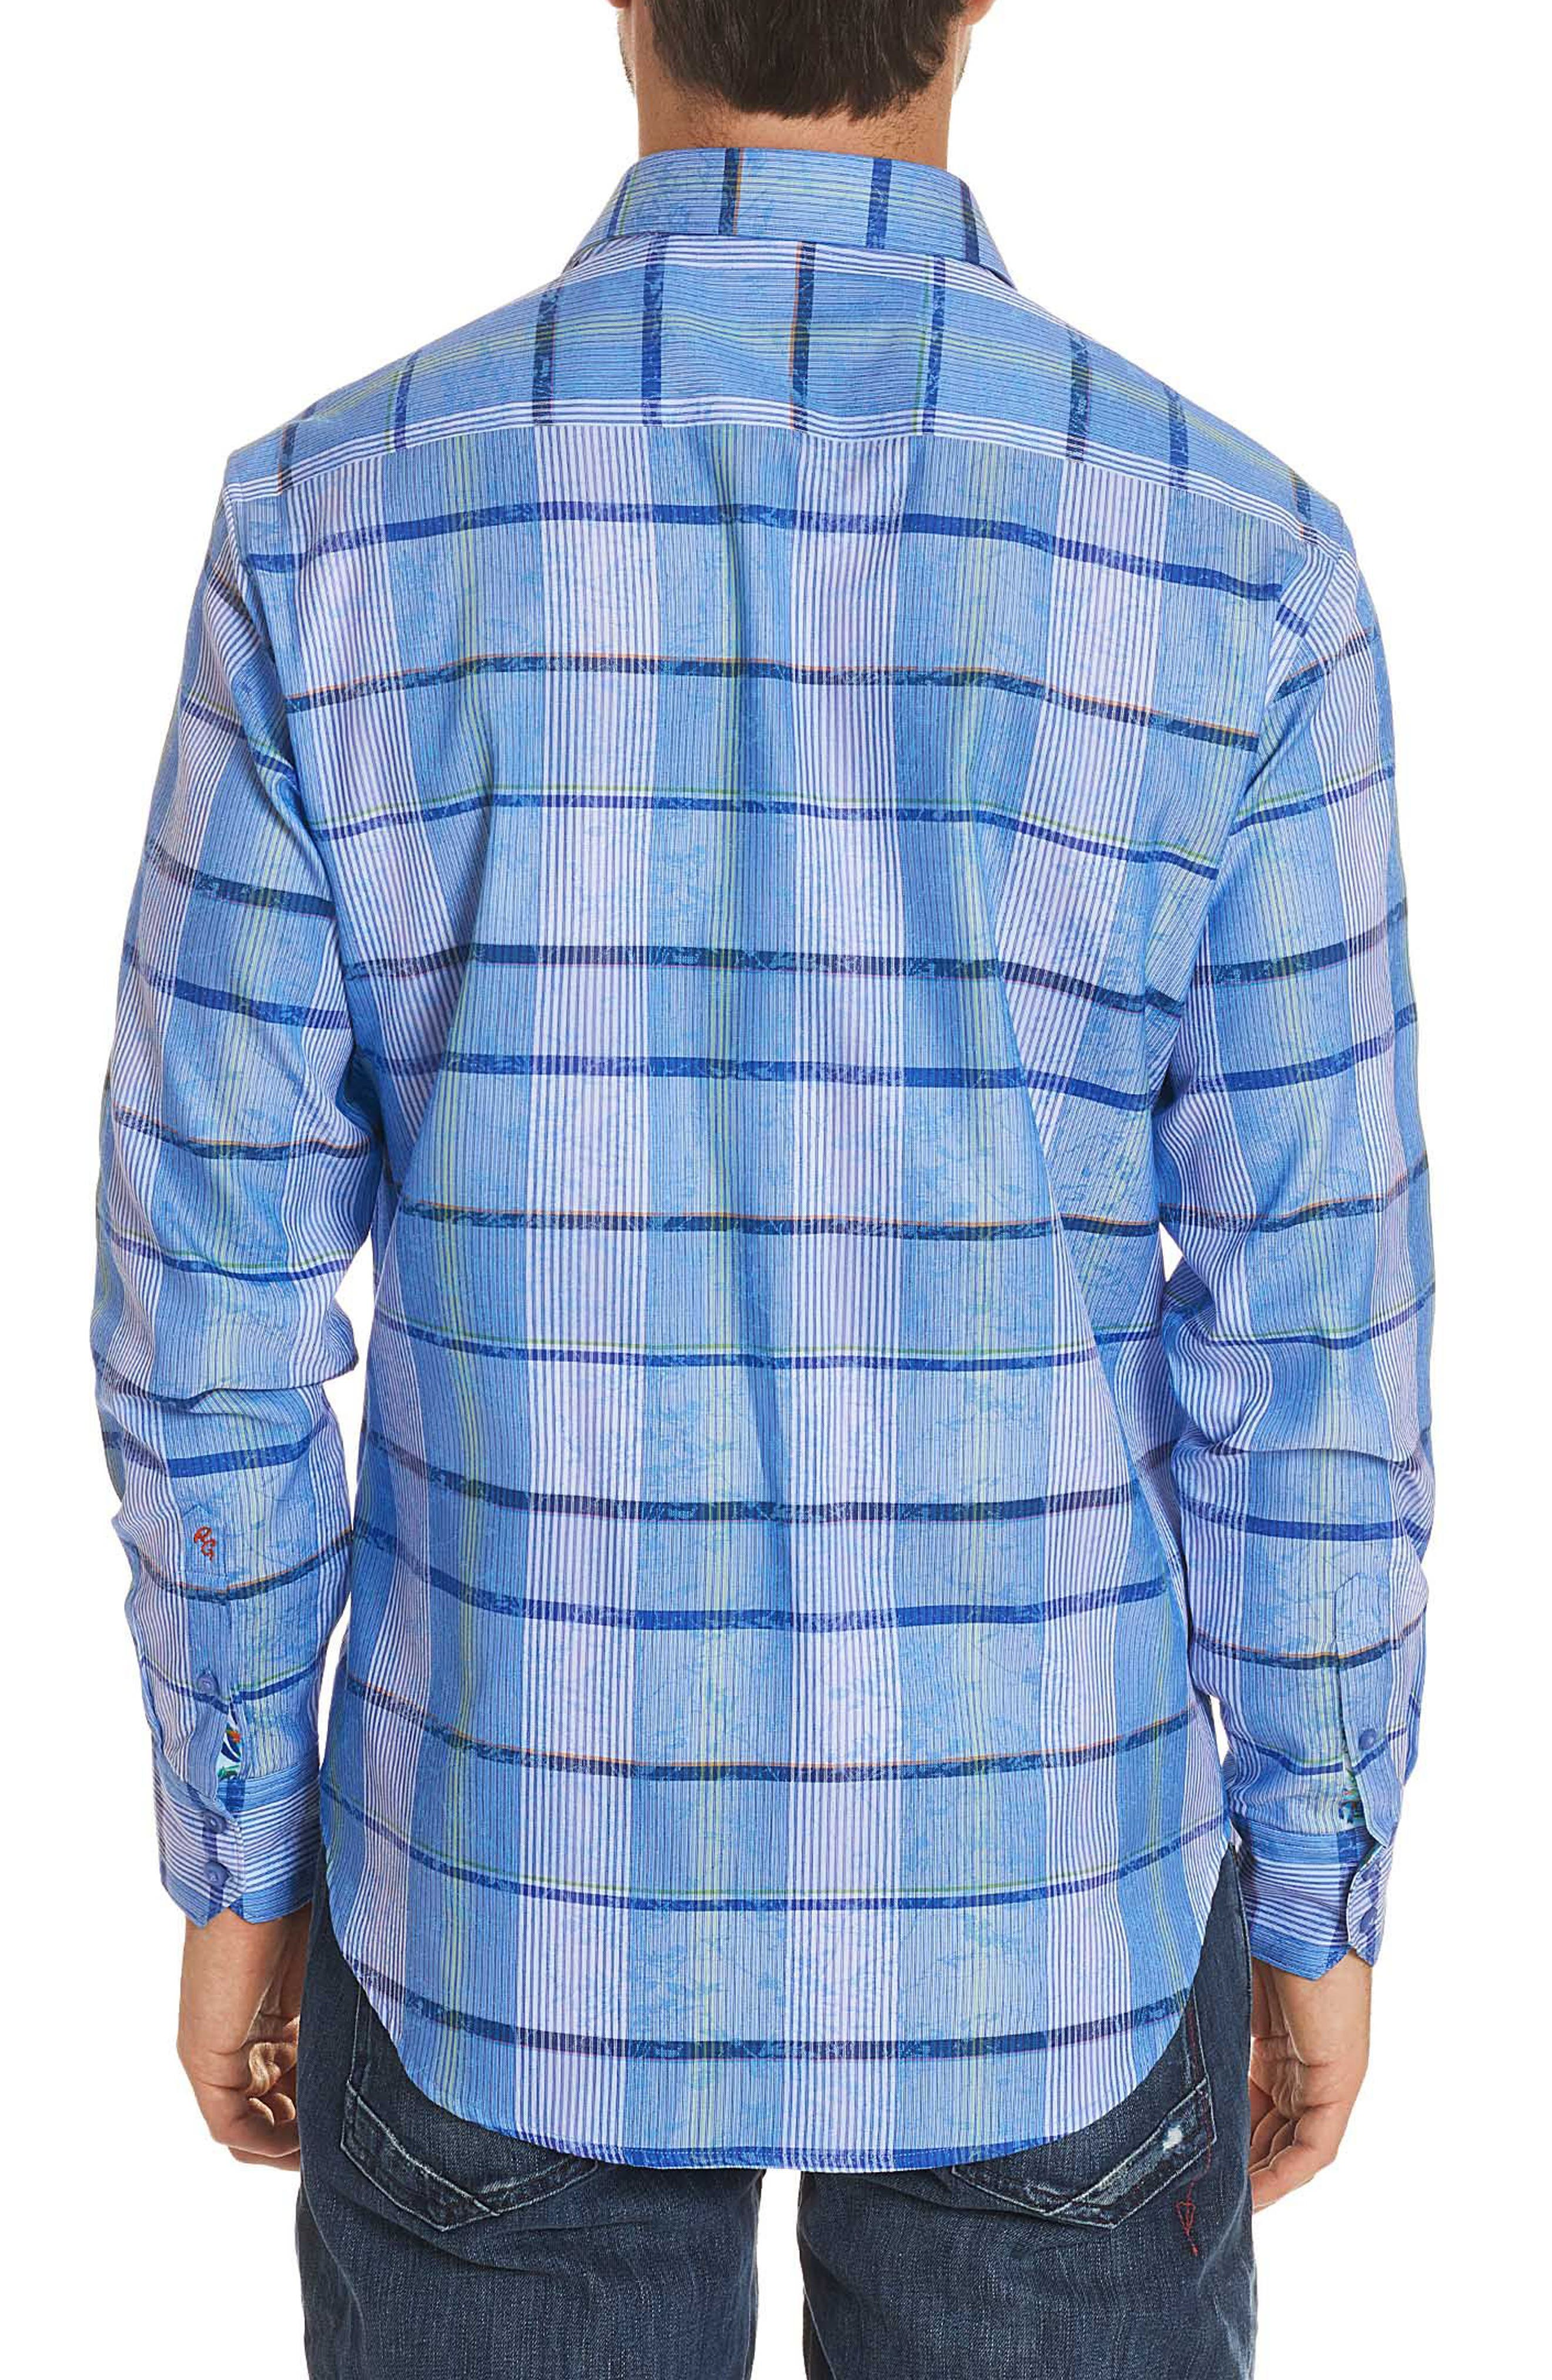 Ferro Classic Fit Sport Shirt,                             Alternate thumbnail 2, color,                             400